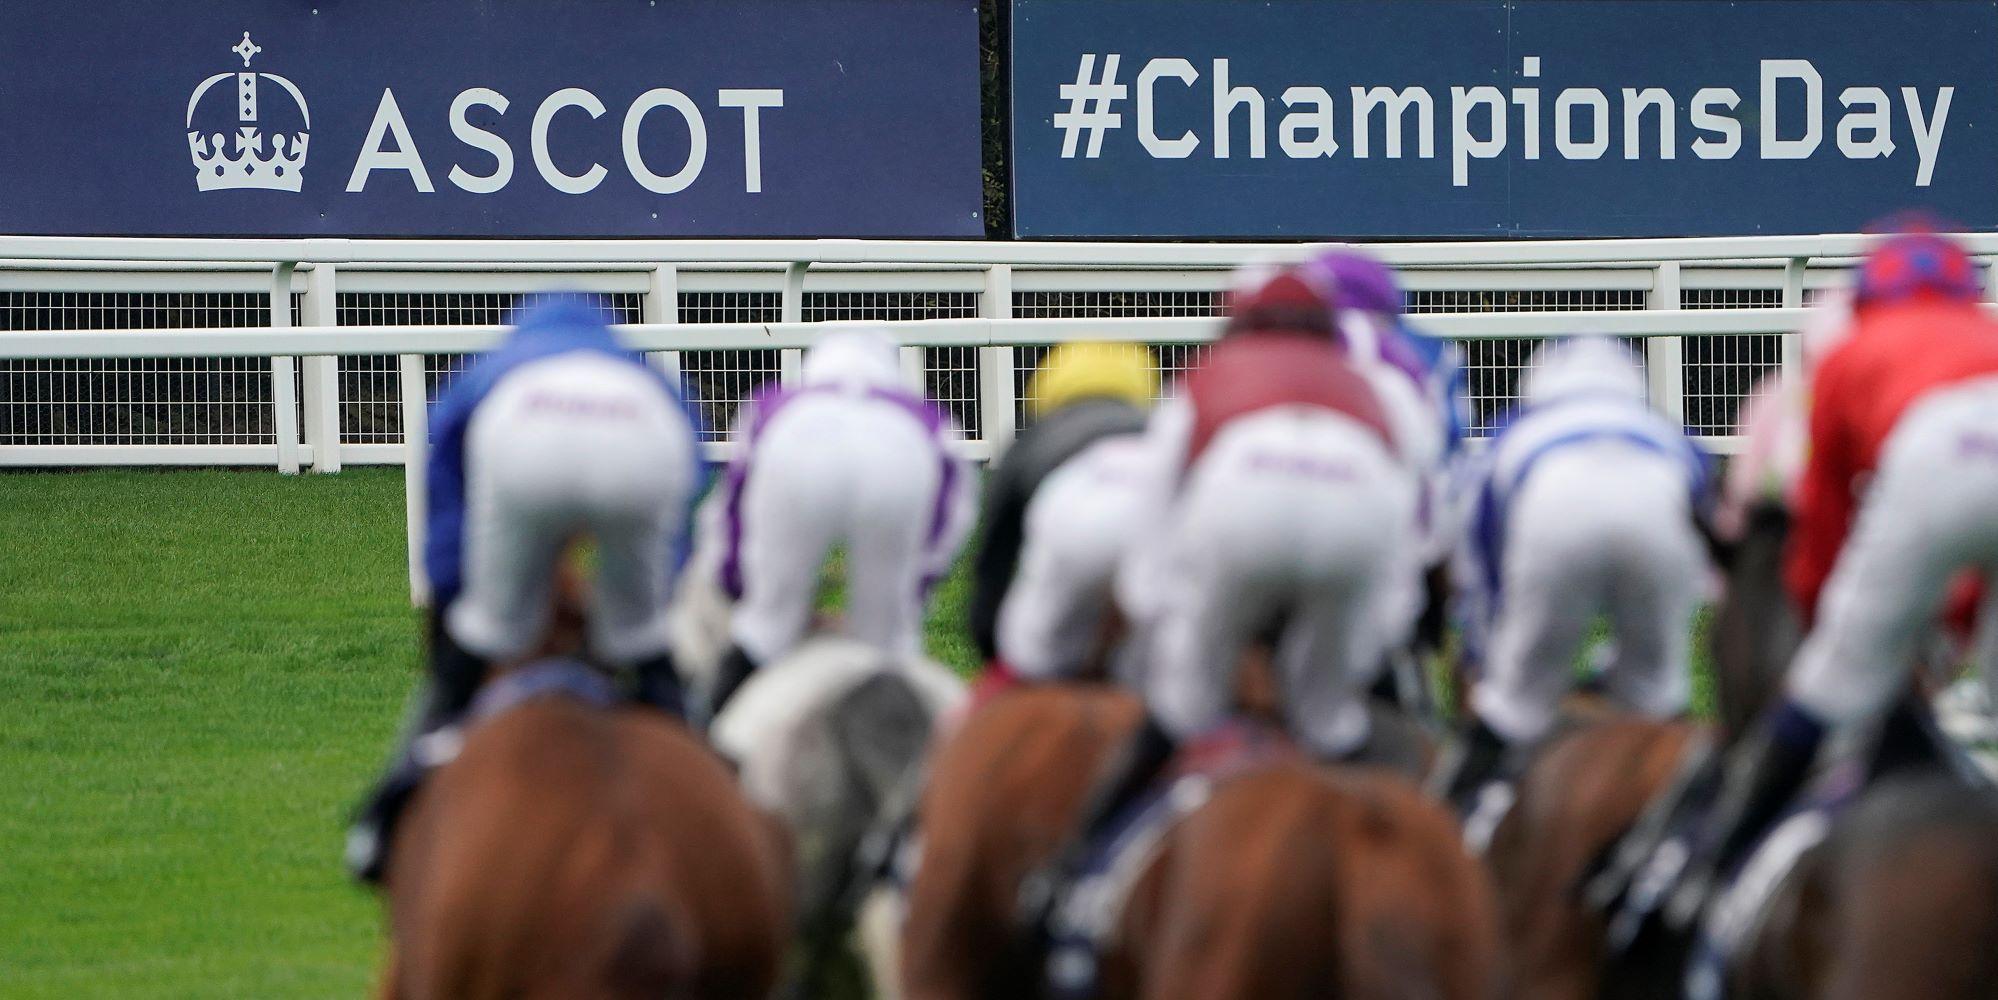 Ascot champions day betting websites falcons vs saints betting odds